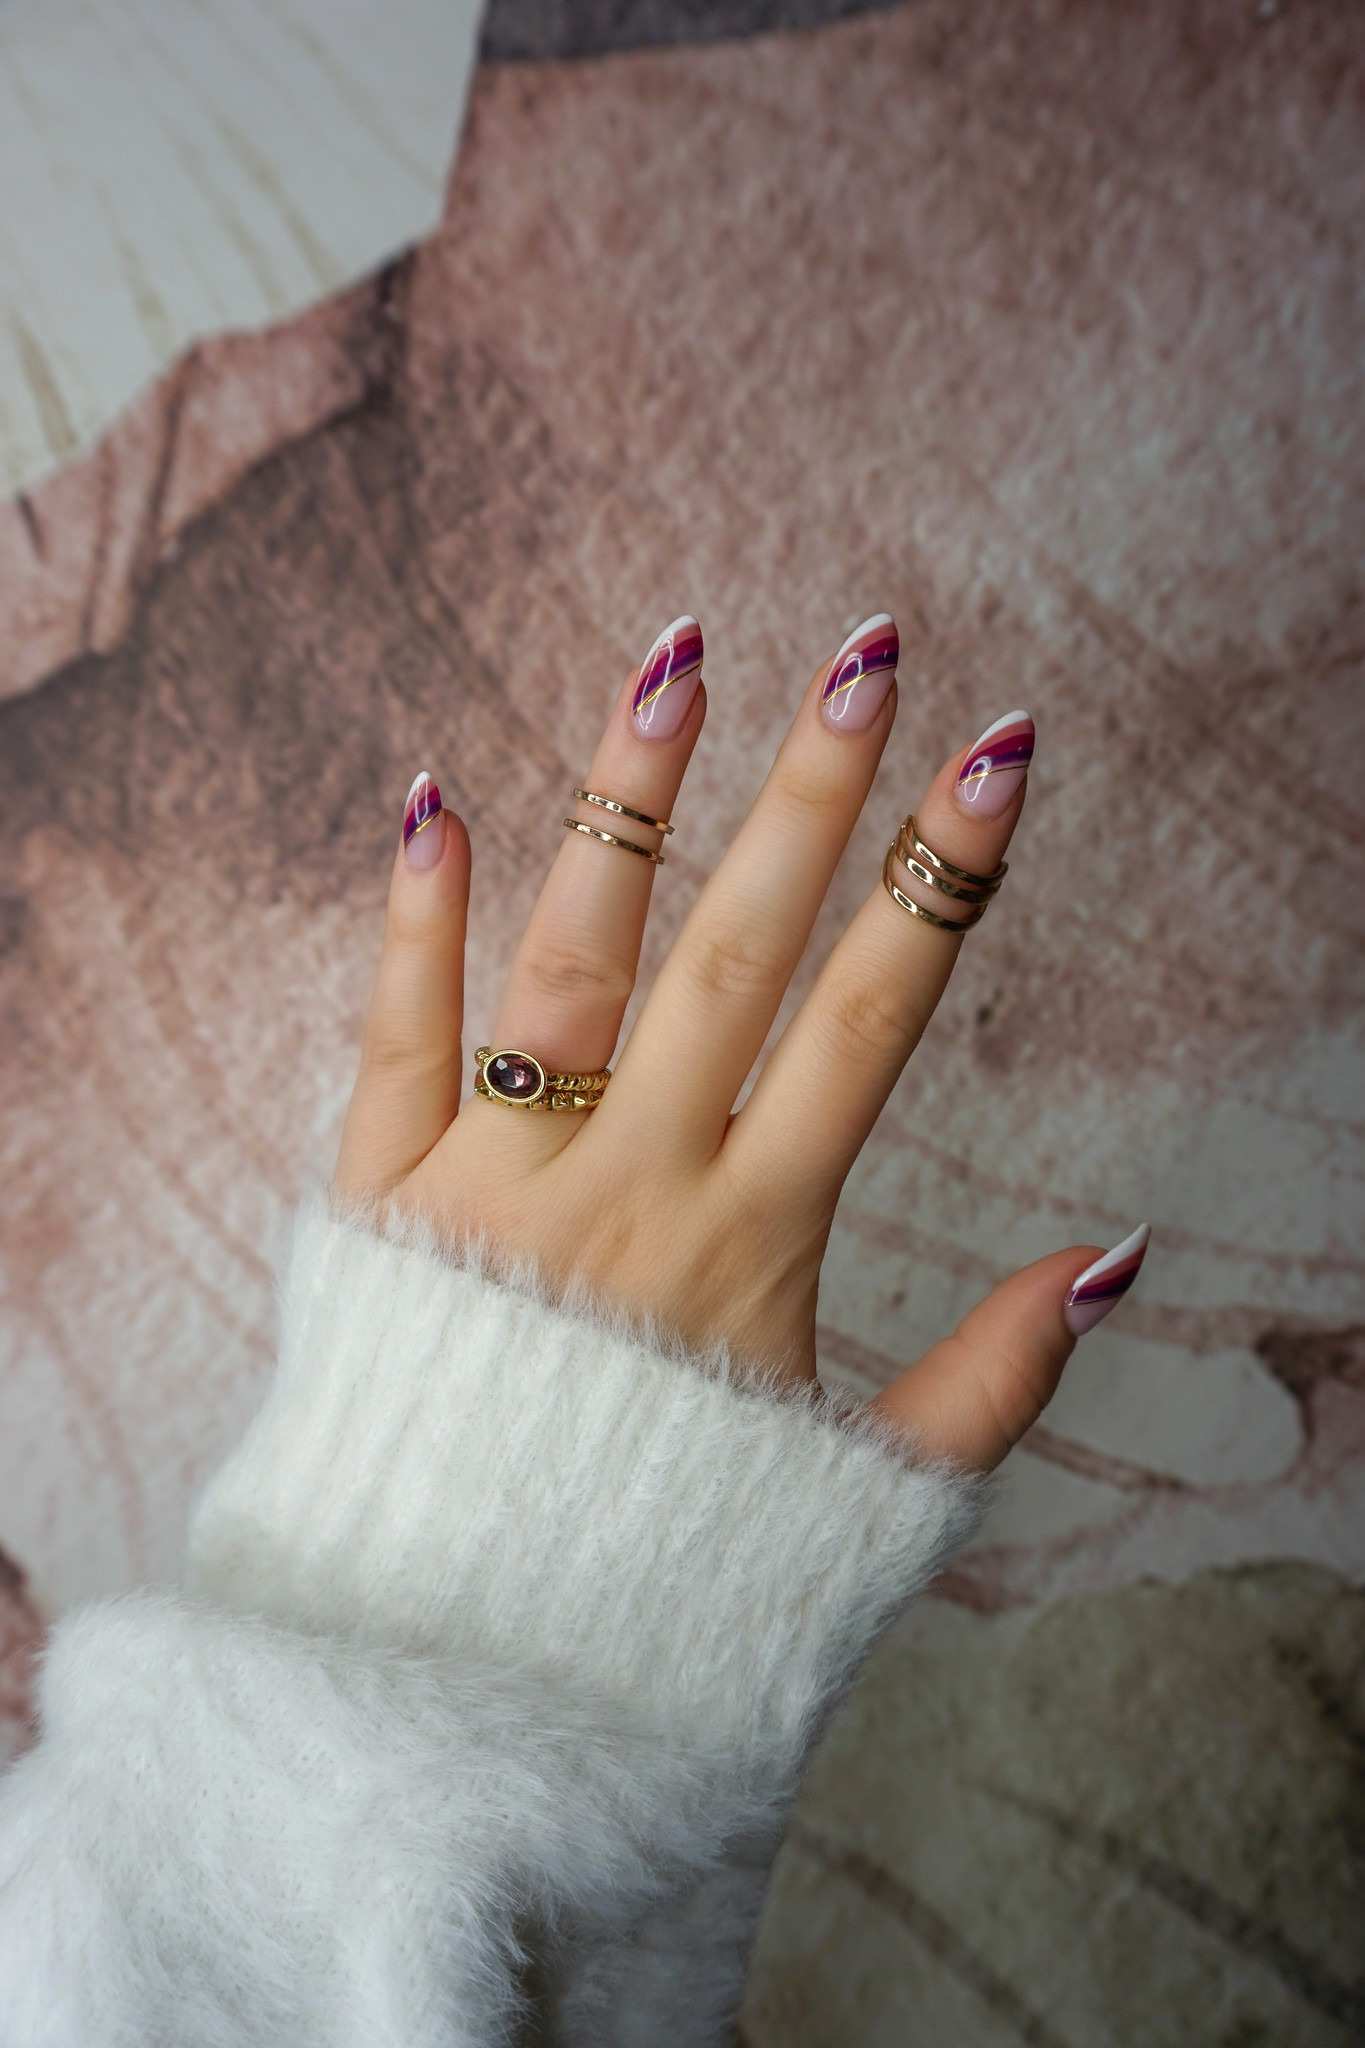 Fall French Twist Nails | Unique French Manicure | Fall Nails | Thanksgiving Nails | November Nails | Nail Ideas | Nail Art Inspiration | Nail Designs | Autumn Rainbow Mani | Gold Rings | Almond Shaped Nails